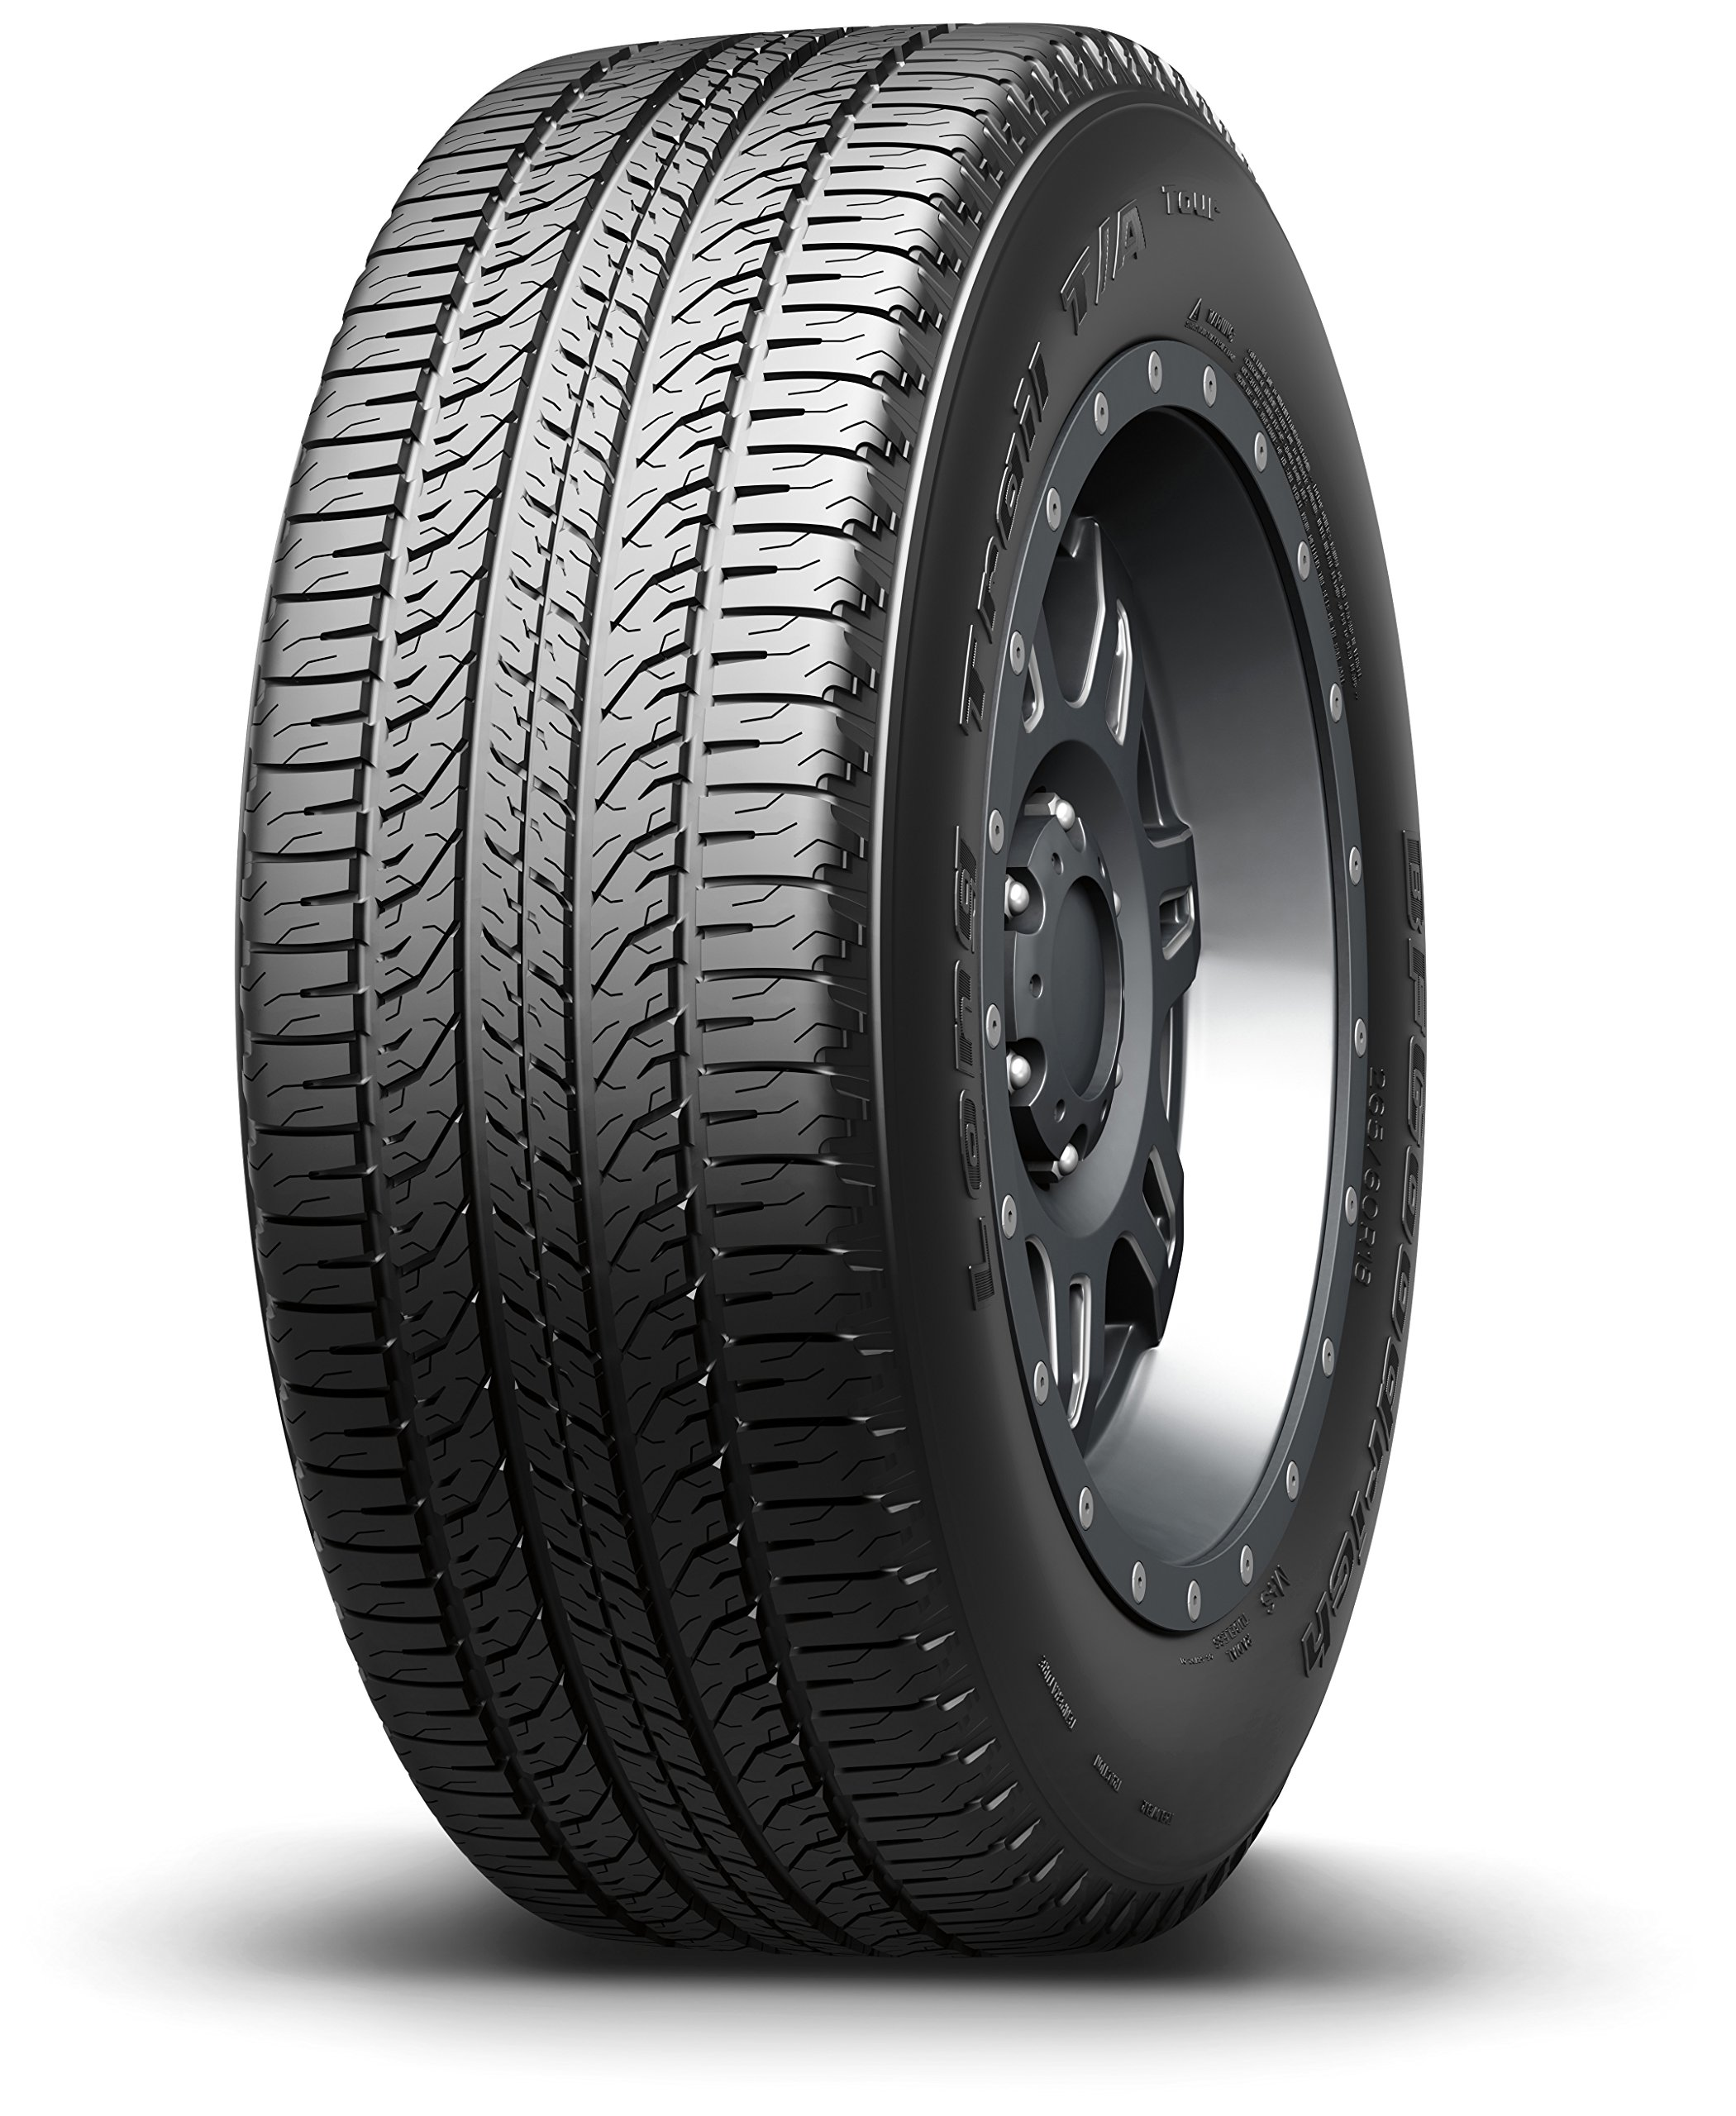 BFGoodrich Long Trail T/A Tour All-Season Radial Tire - P275/60R17 110T